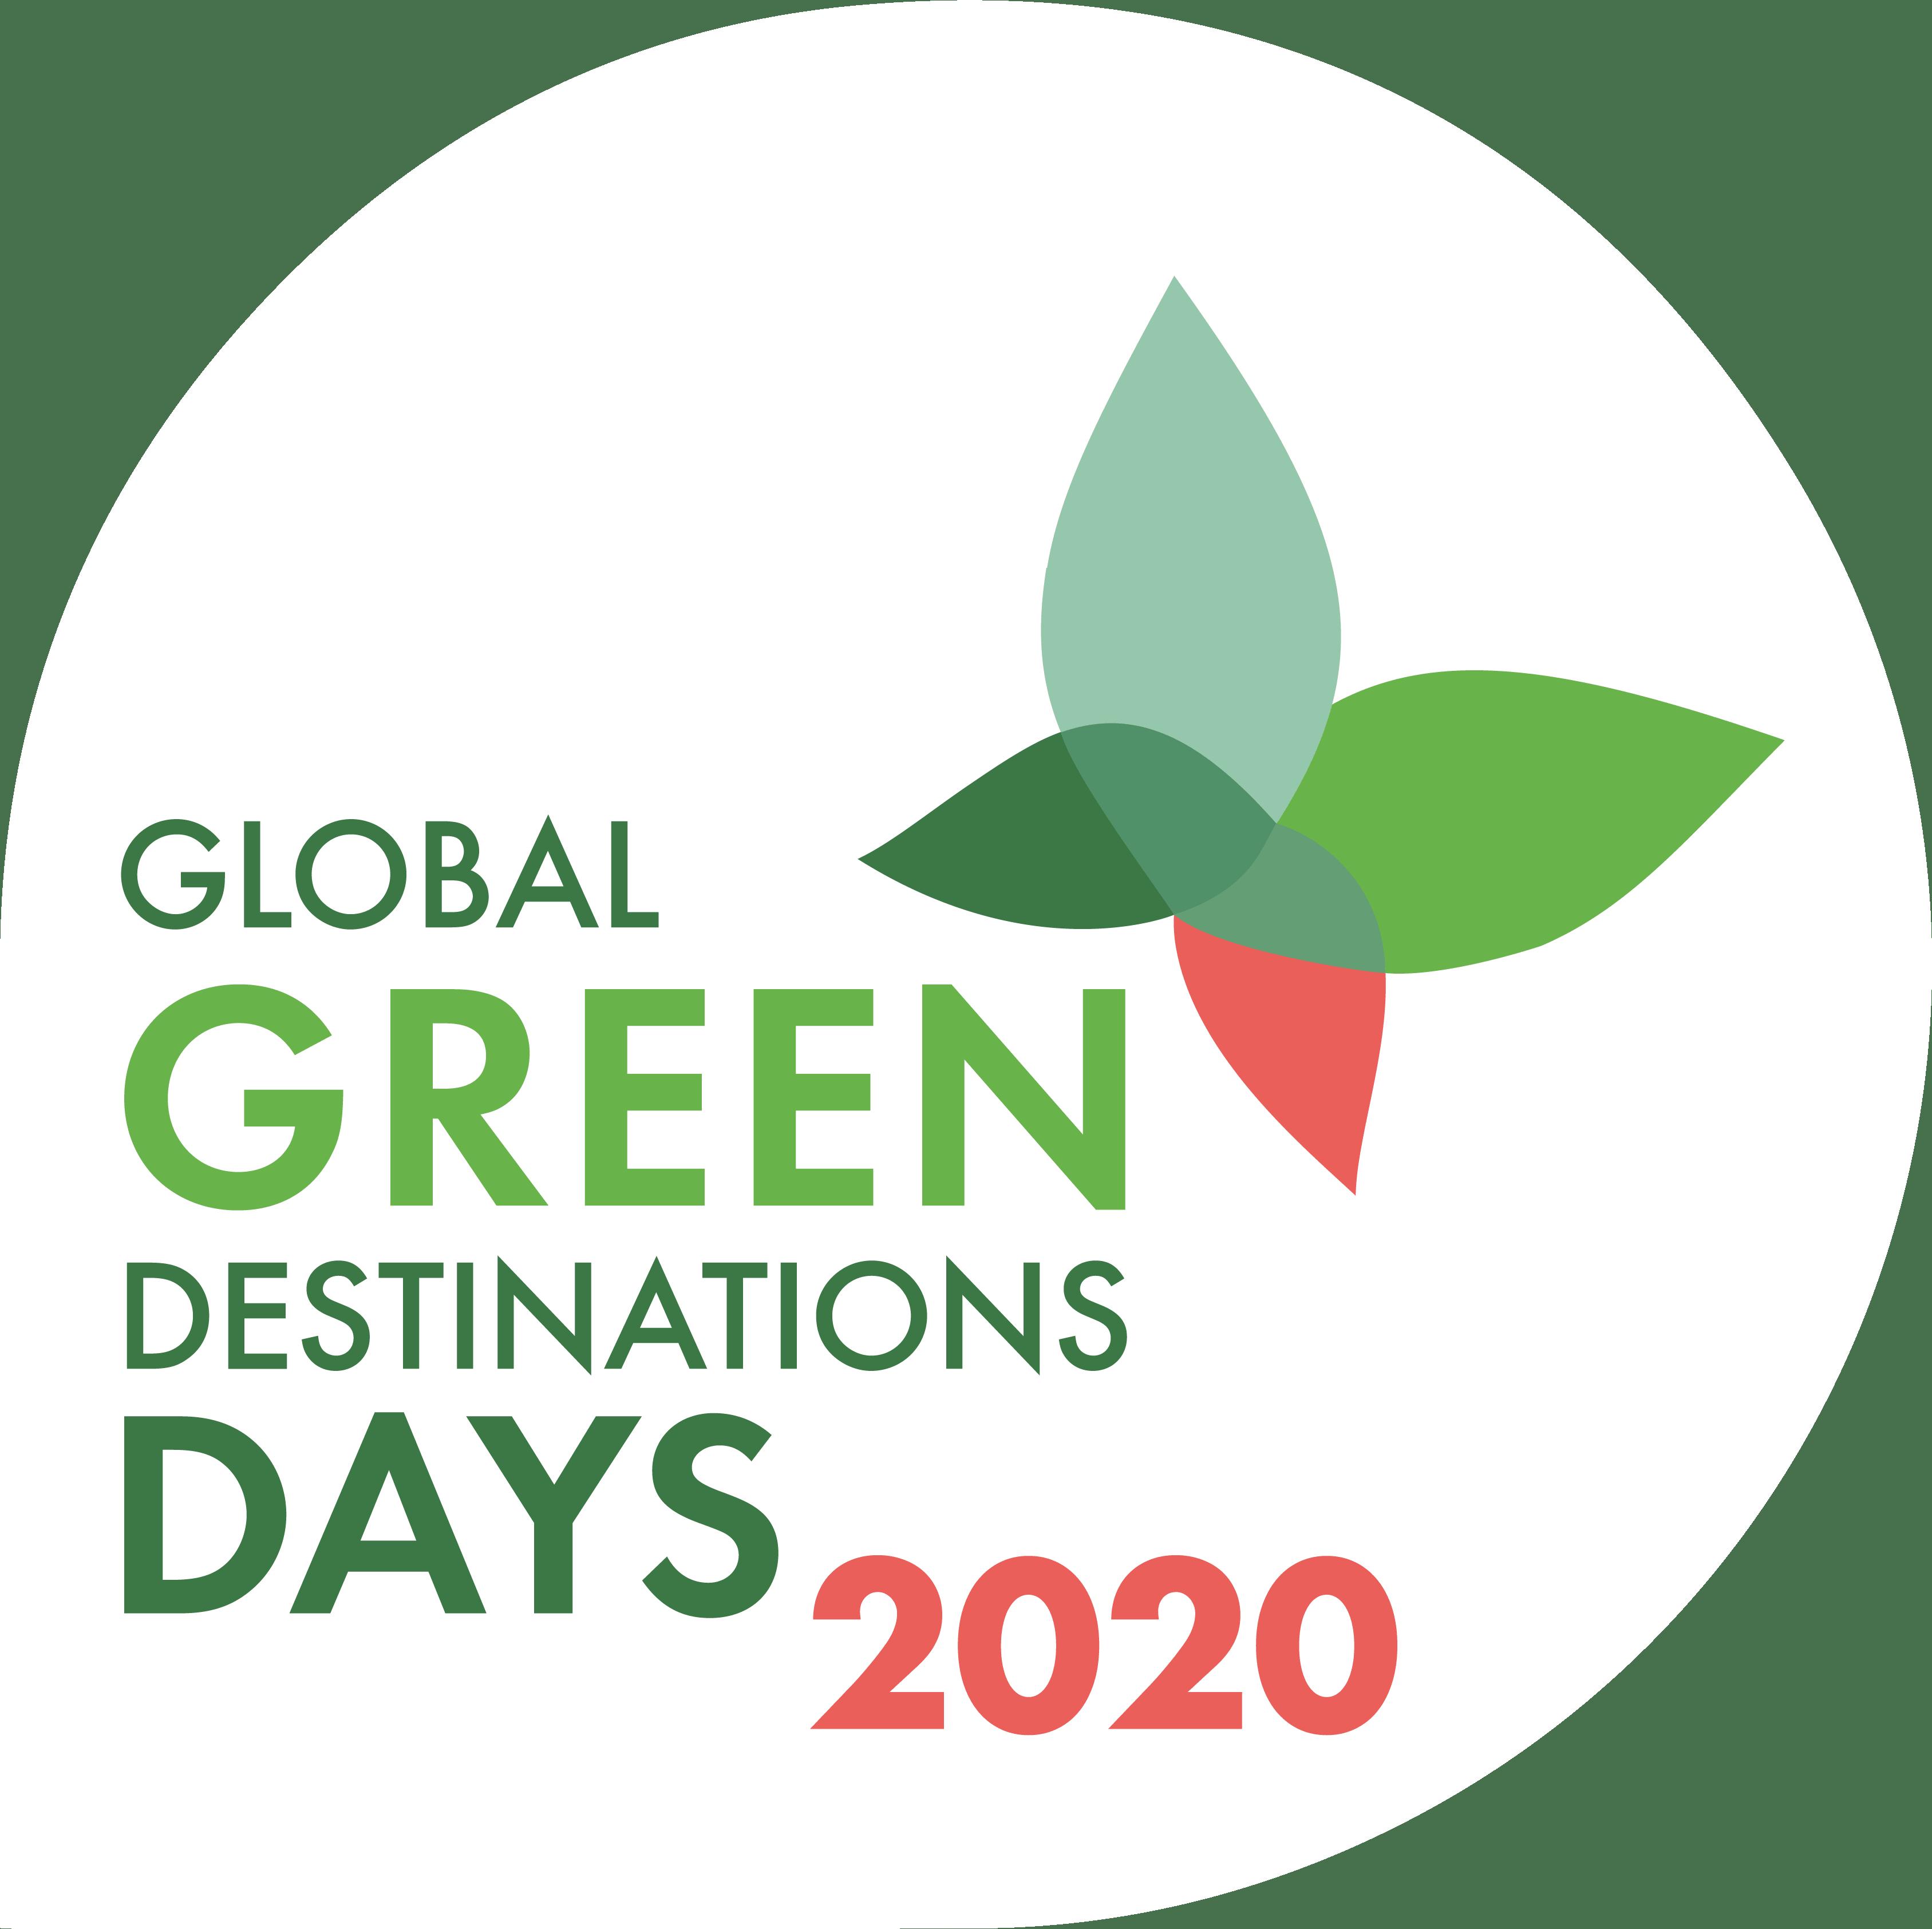 Global Green Destination Days